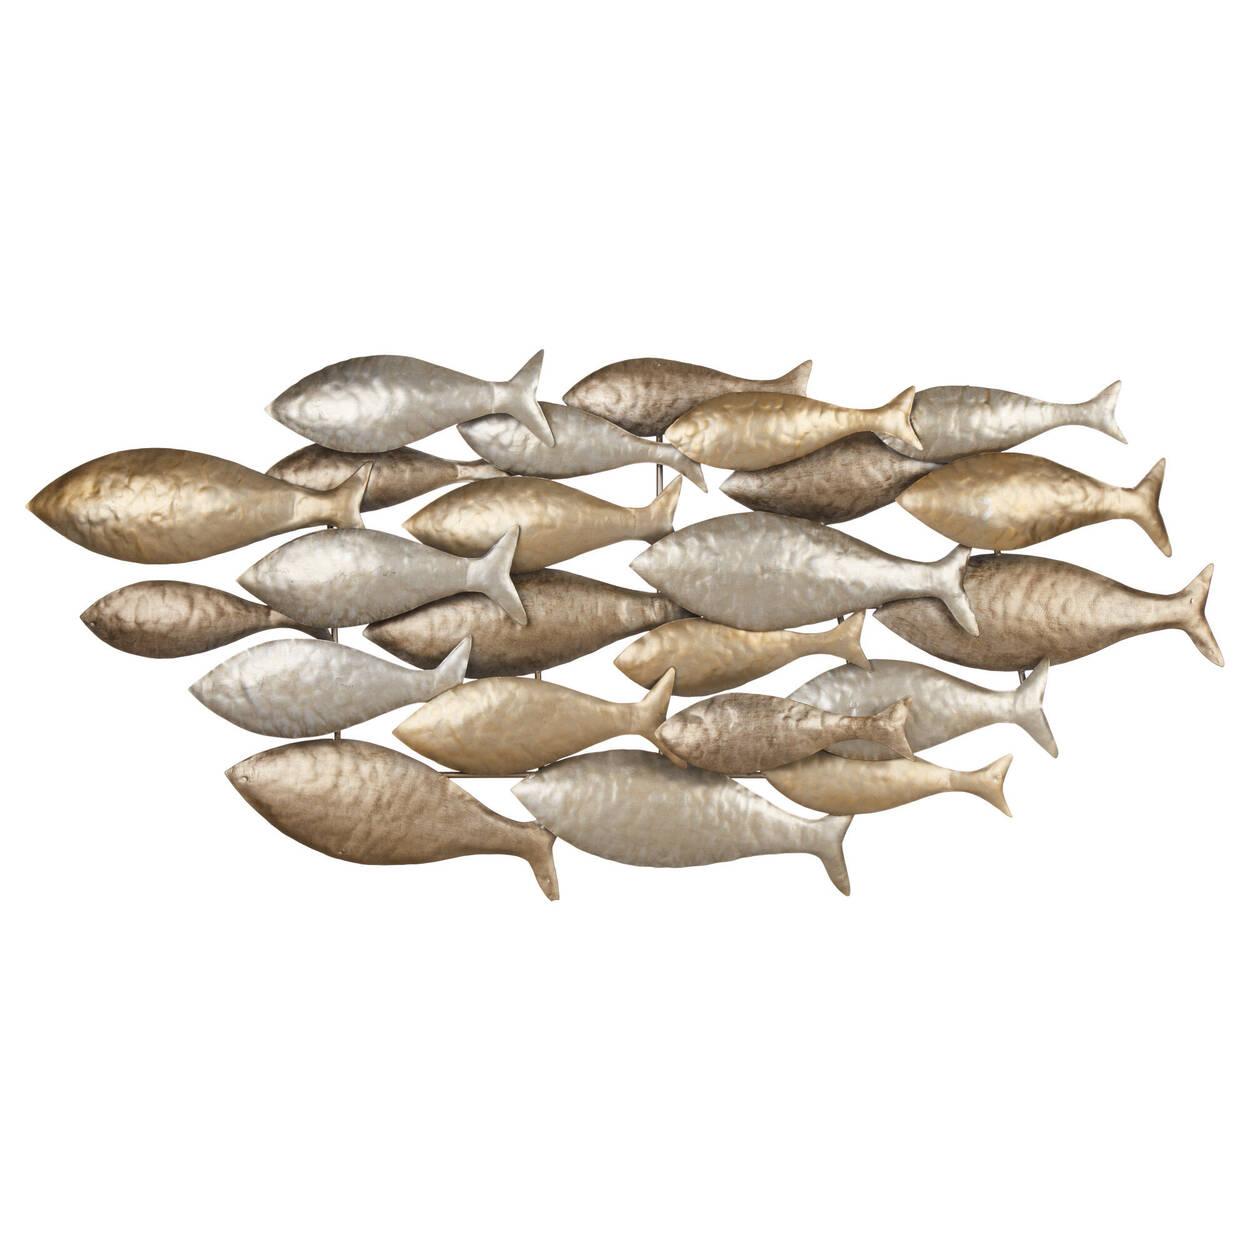 Art mural en métal banc de poissons